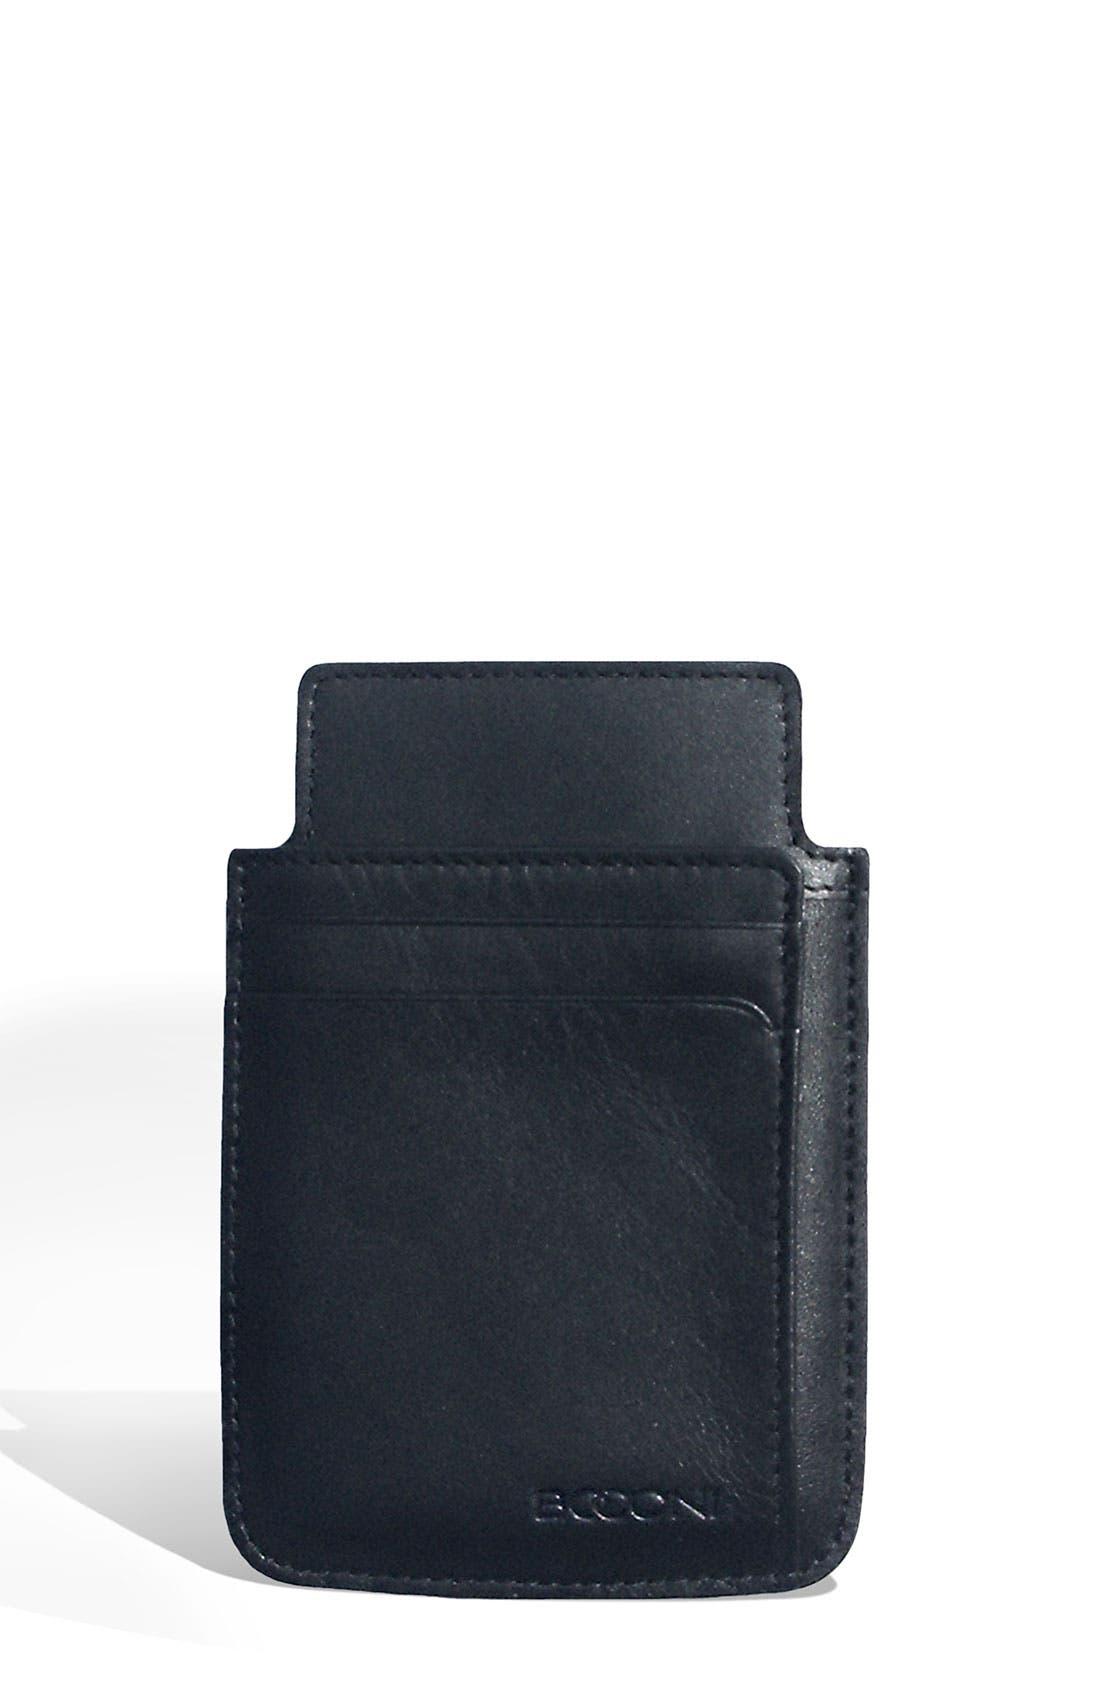 Alternate Image 1 Selected - Boconi Leather Smartphone Sheath